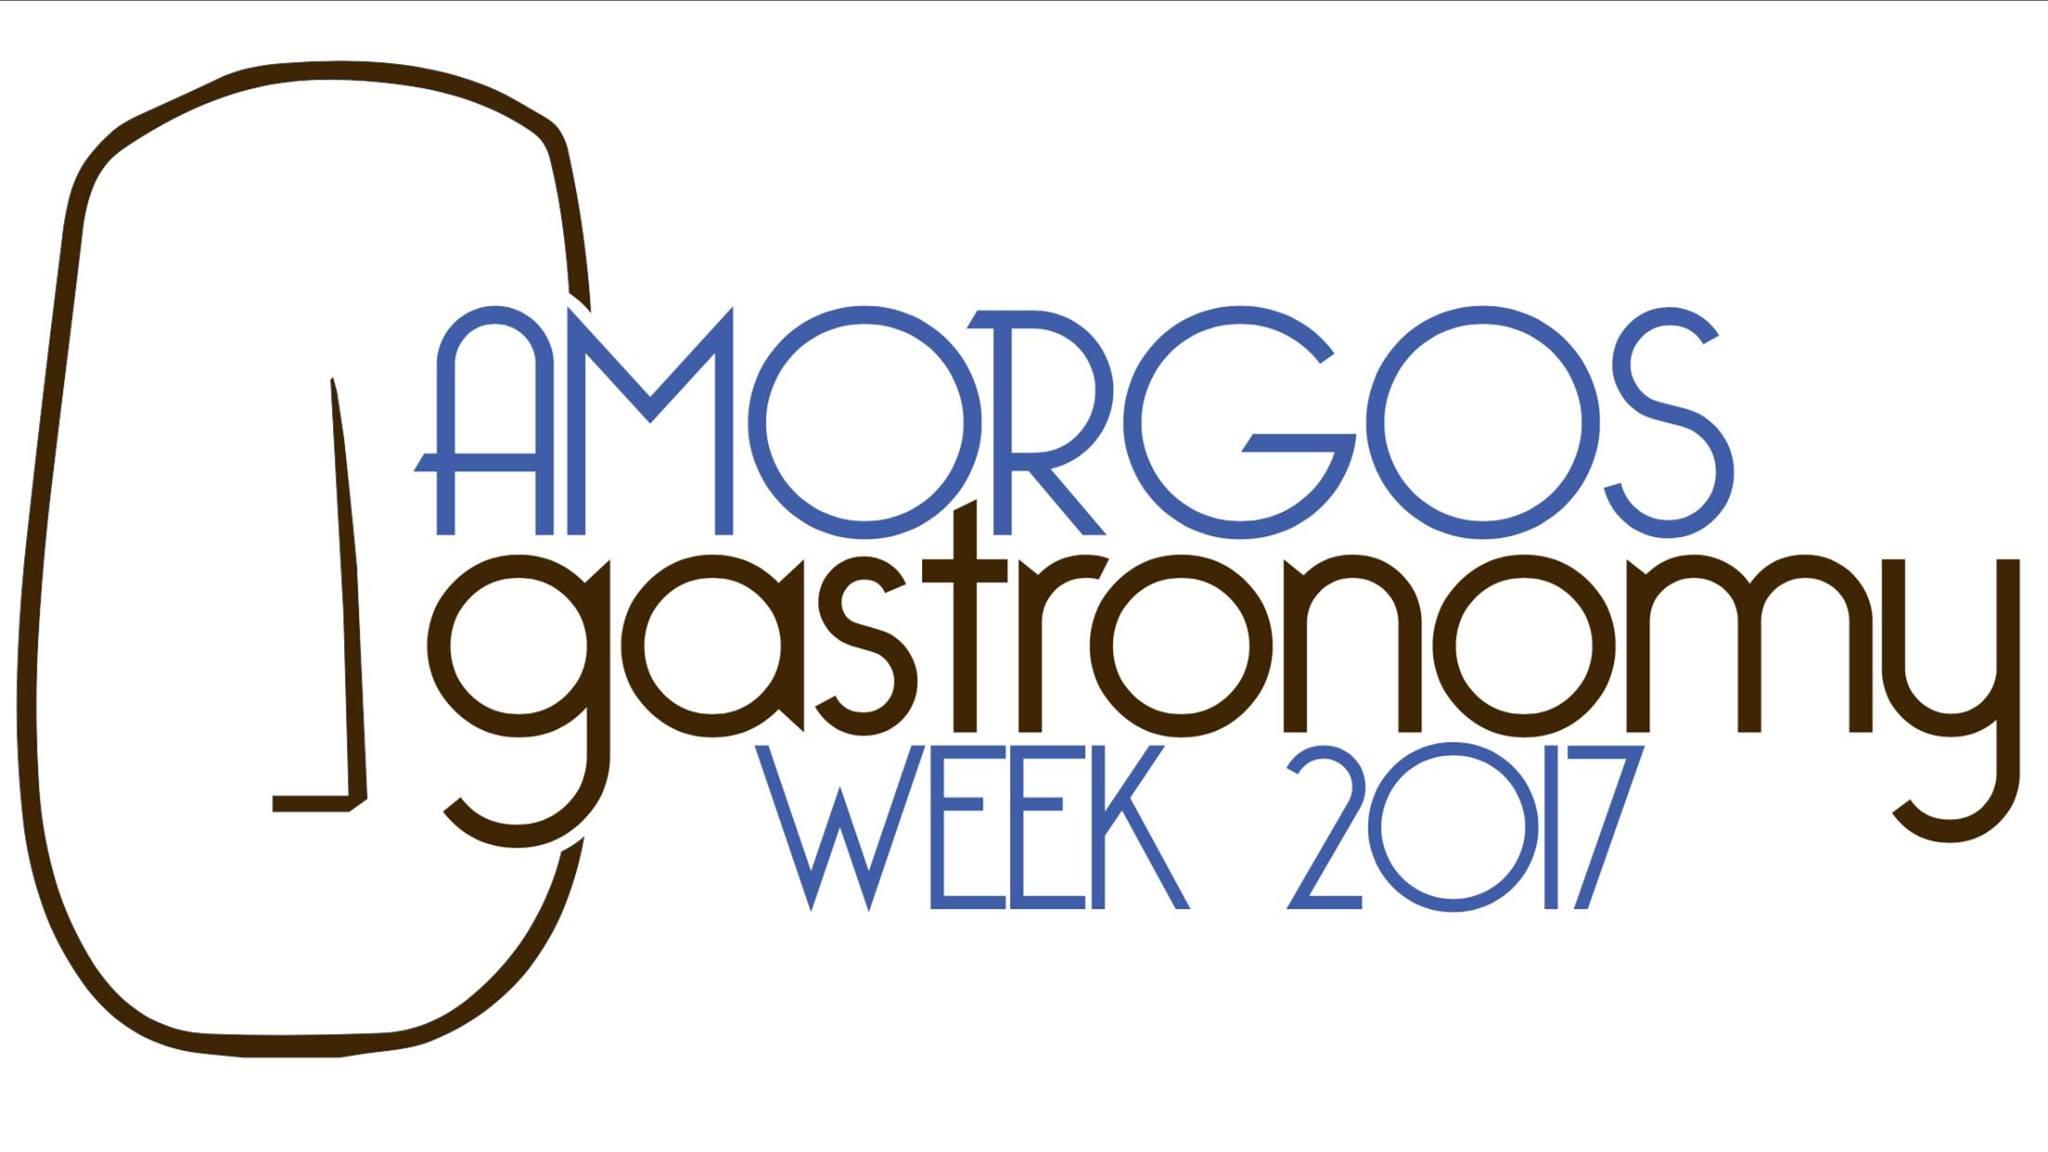 amorgosgastronomy week